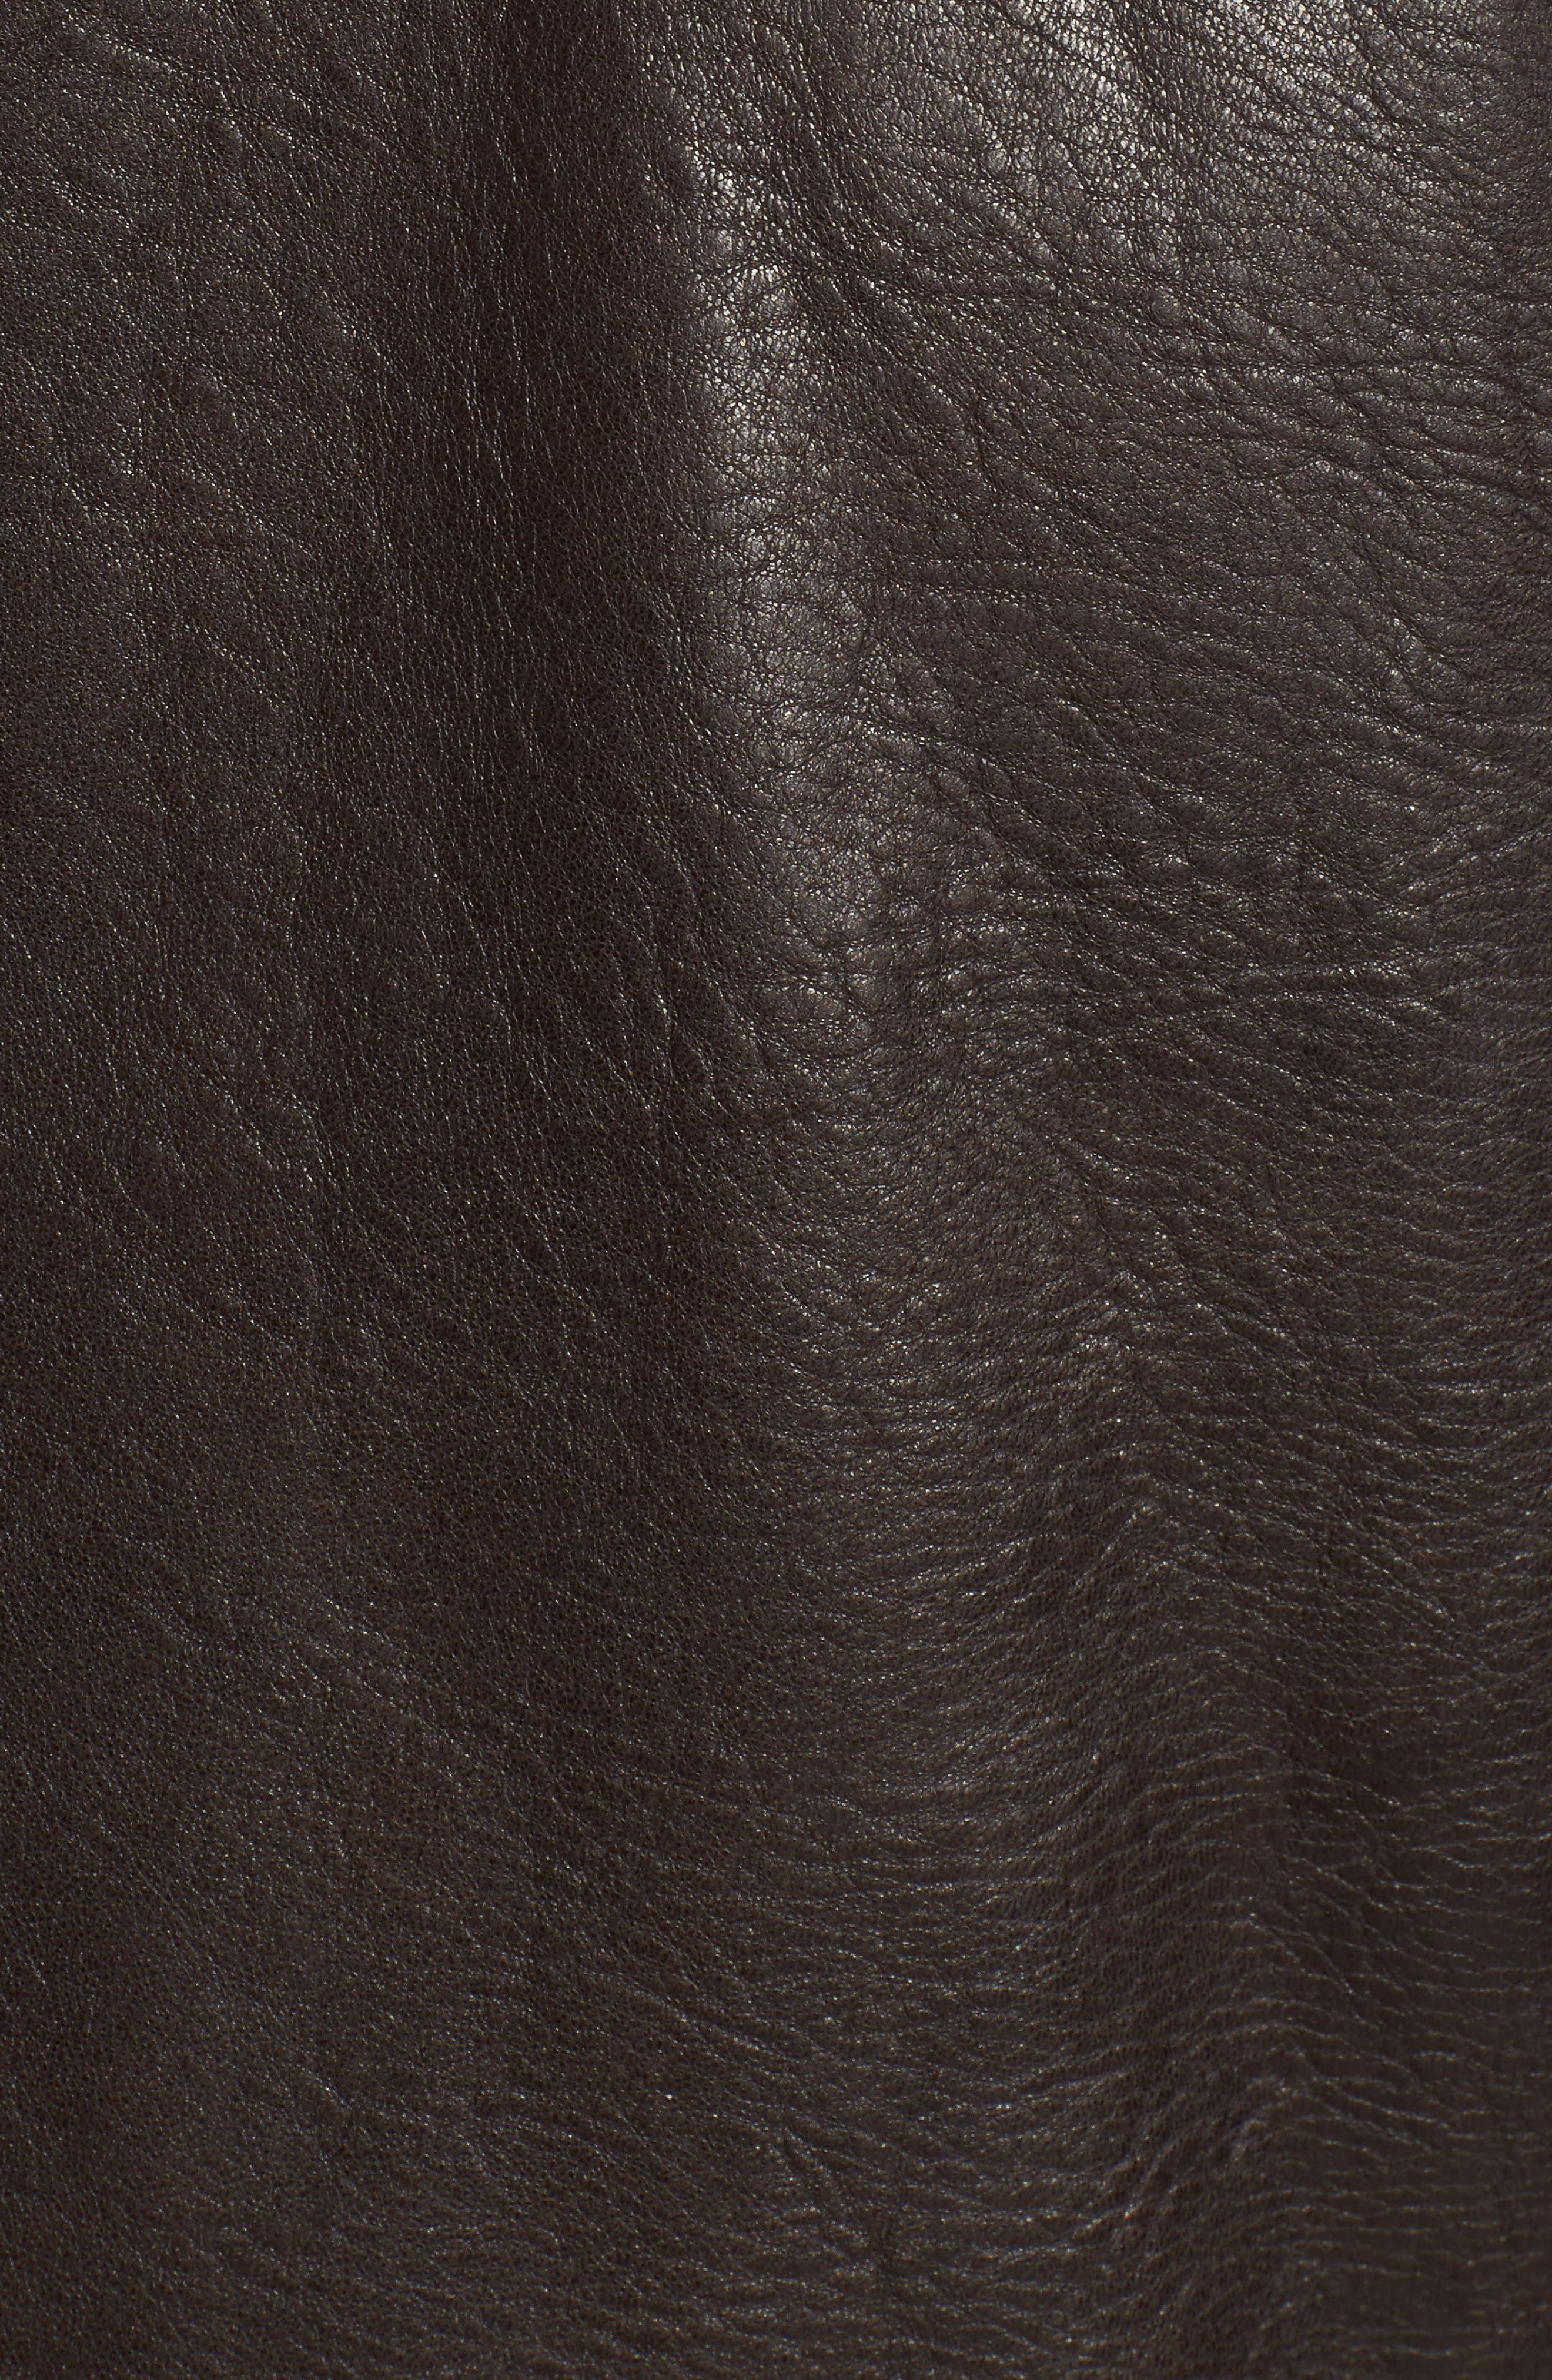 Morrison Spread Collar Leather Jacket,                             Alternate thumbnail 6, color,                             200